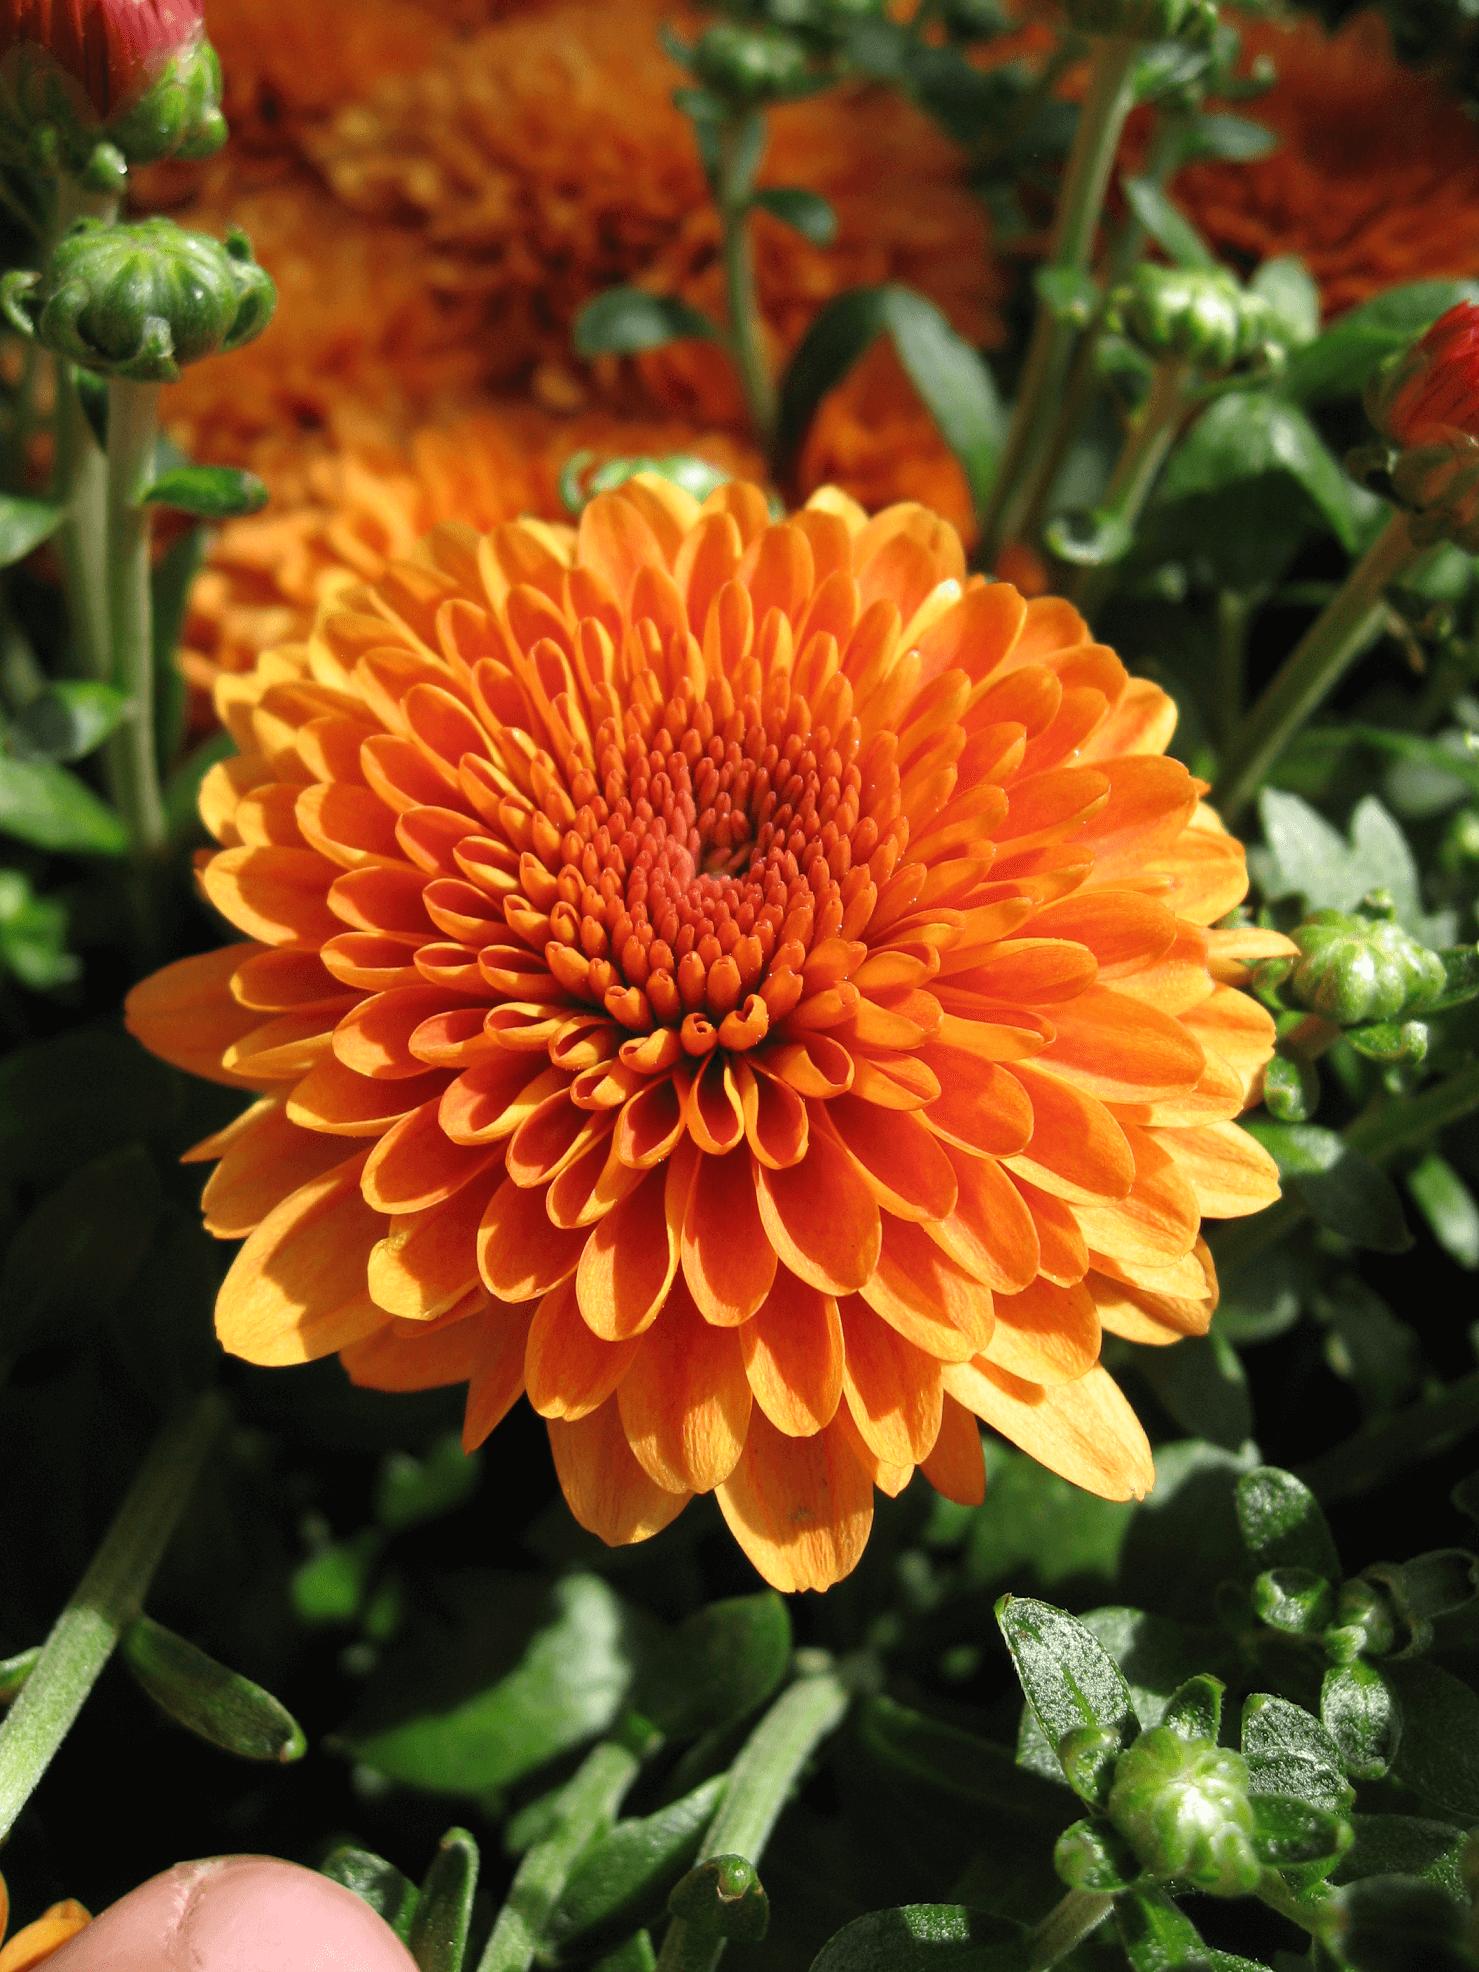 Chrysanthemum Orange Chrysanthemum Flowers Online Chrysanthemum Flower